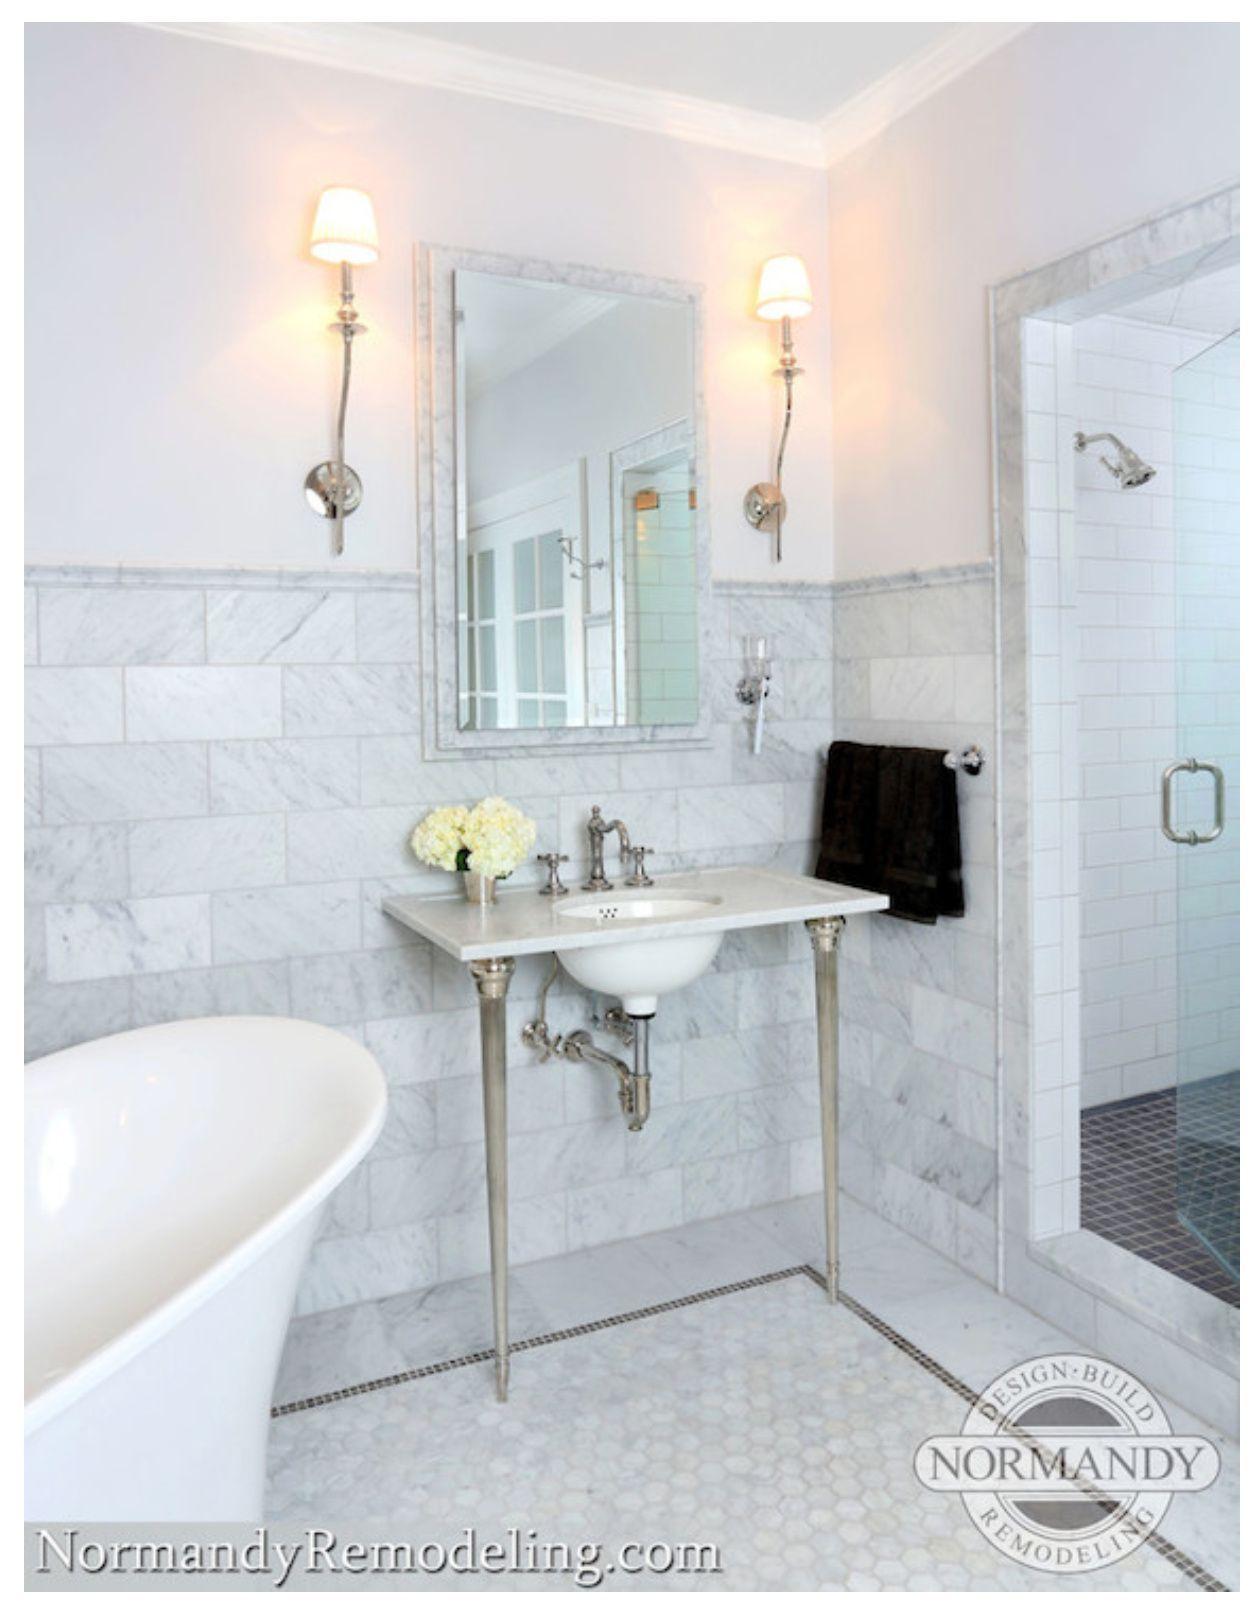 Master Bathroom Makeover Picks Finishes Miss Mustard Seed Carrera Marble Bathroom Marble Bathroom Floor Marble Bathroom